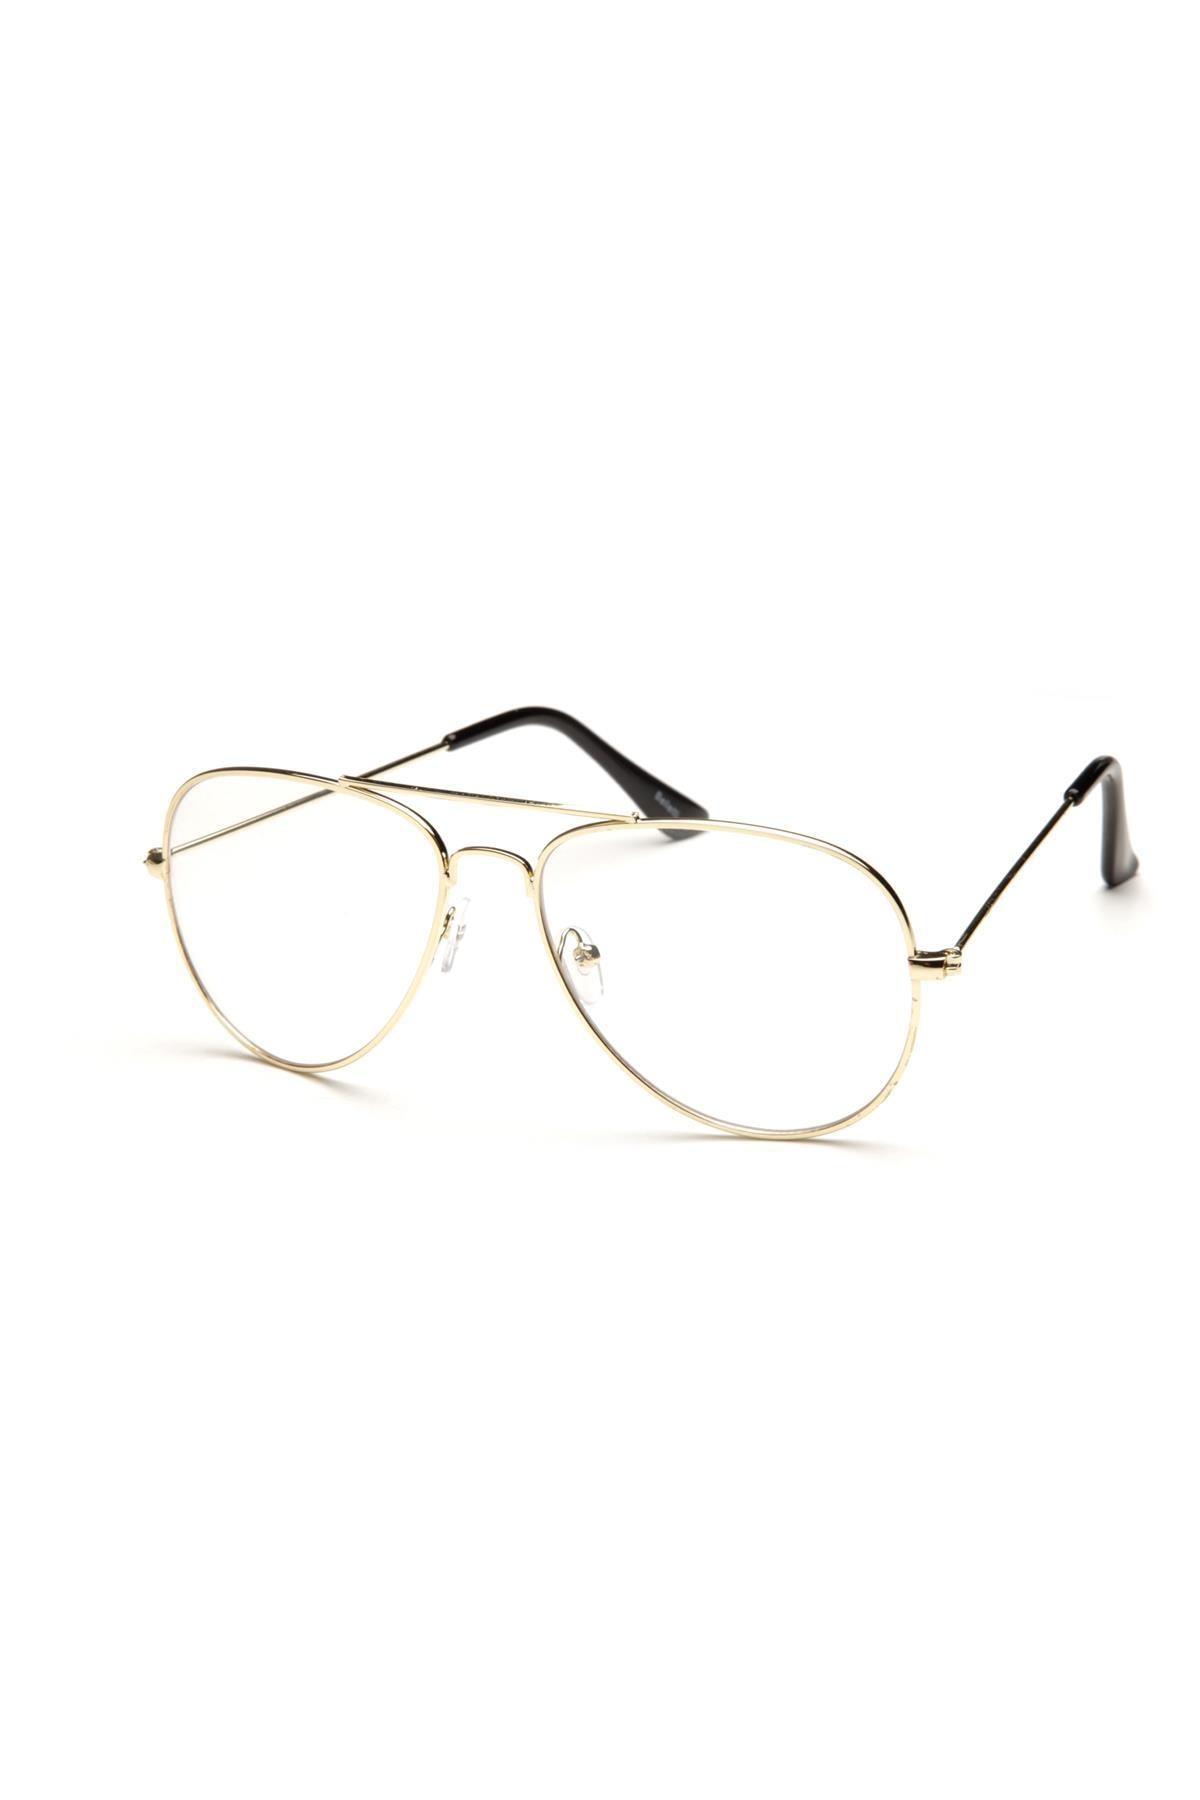 Di Caprio Unisex Oval Güneş Gözlüğü DH1548R